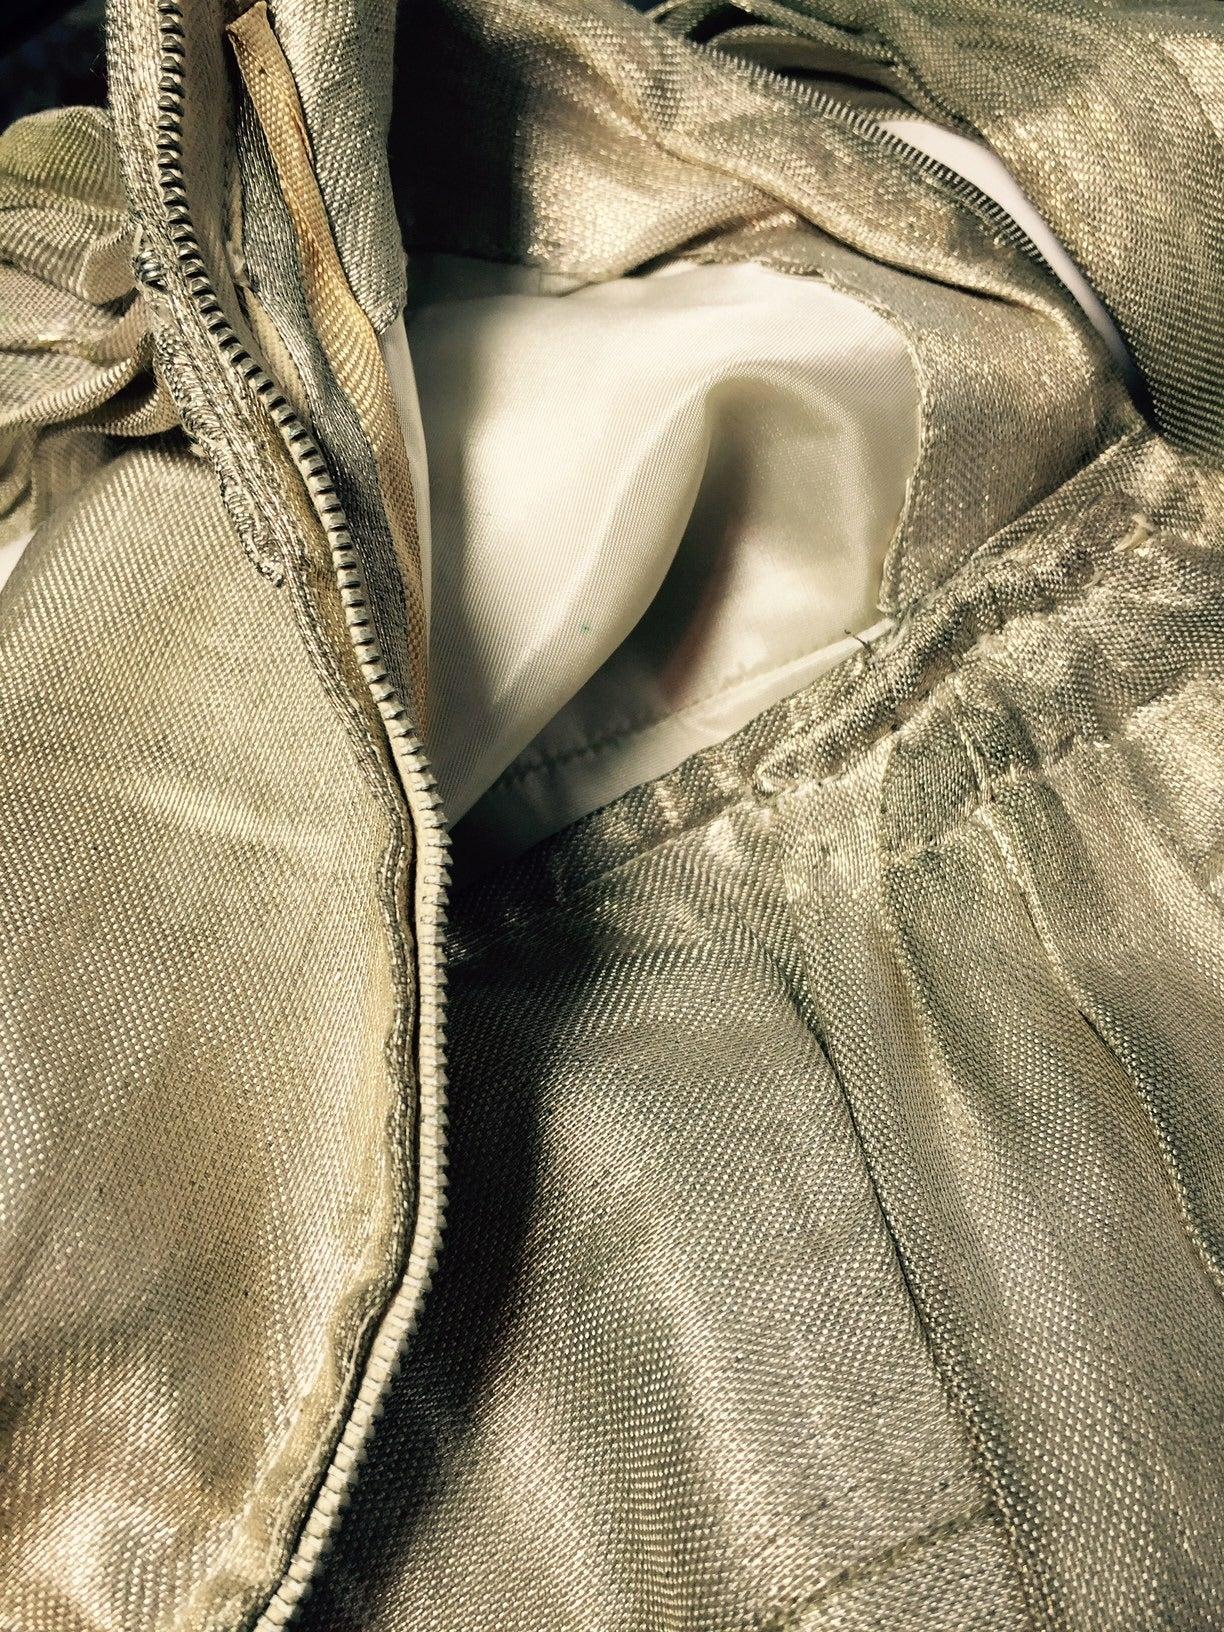 1940s Silver Metal Lame Halter Dress w/ Sarong Draping 6